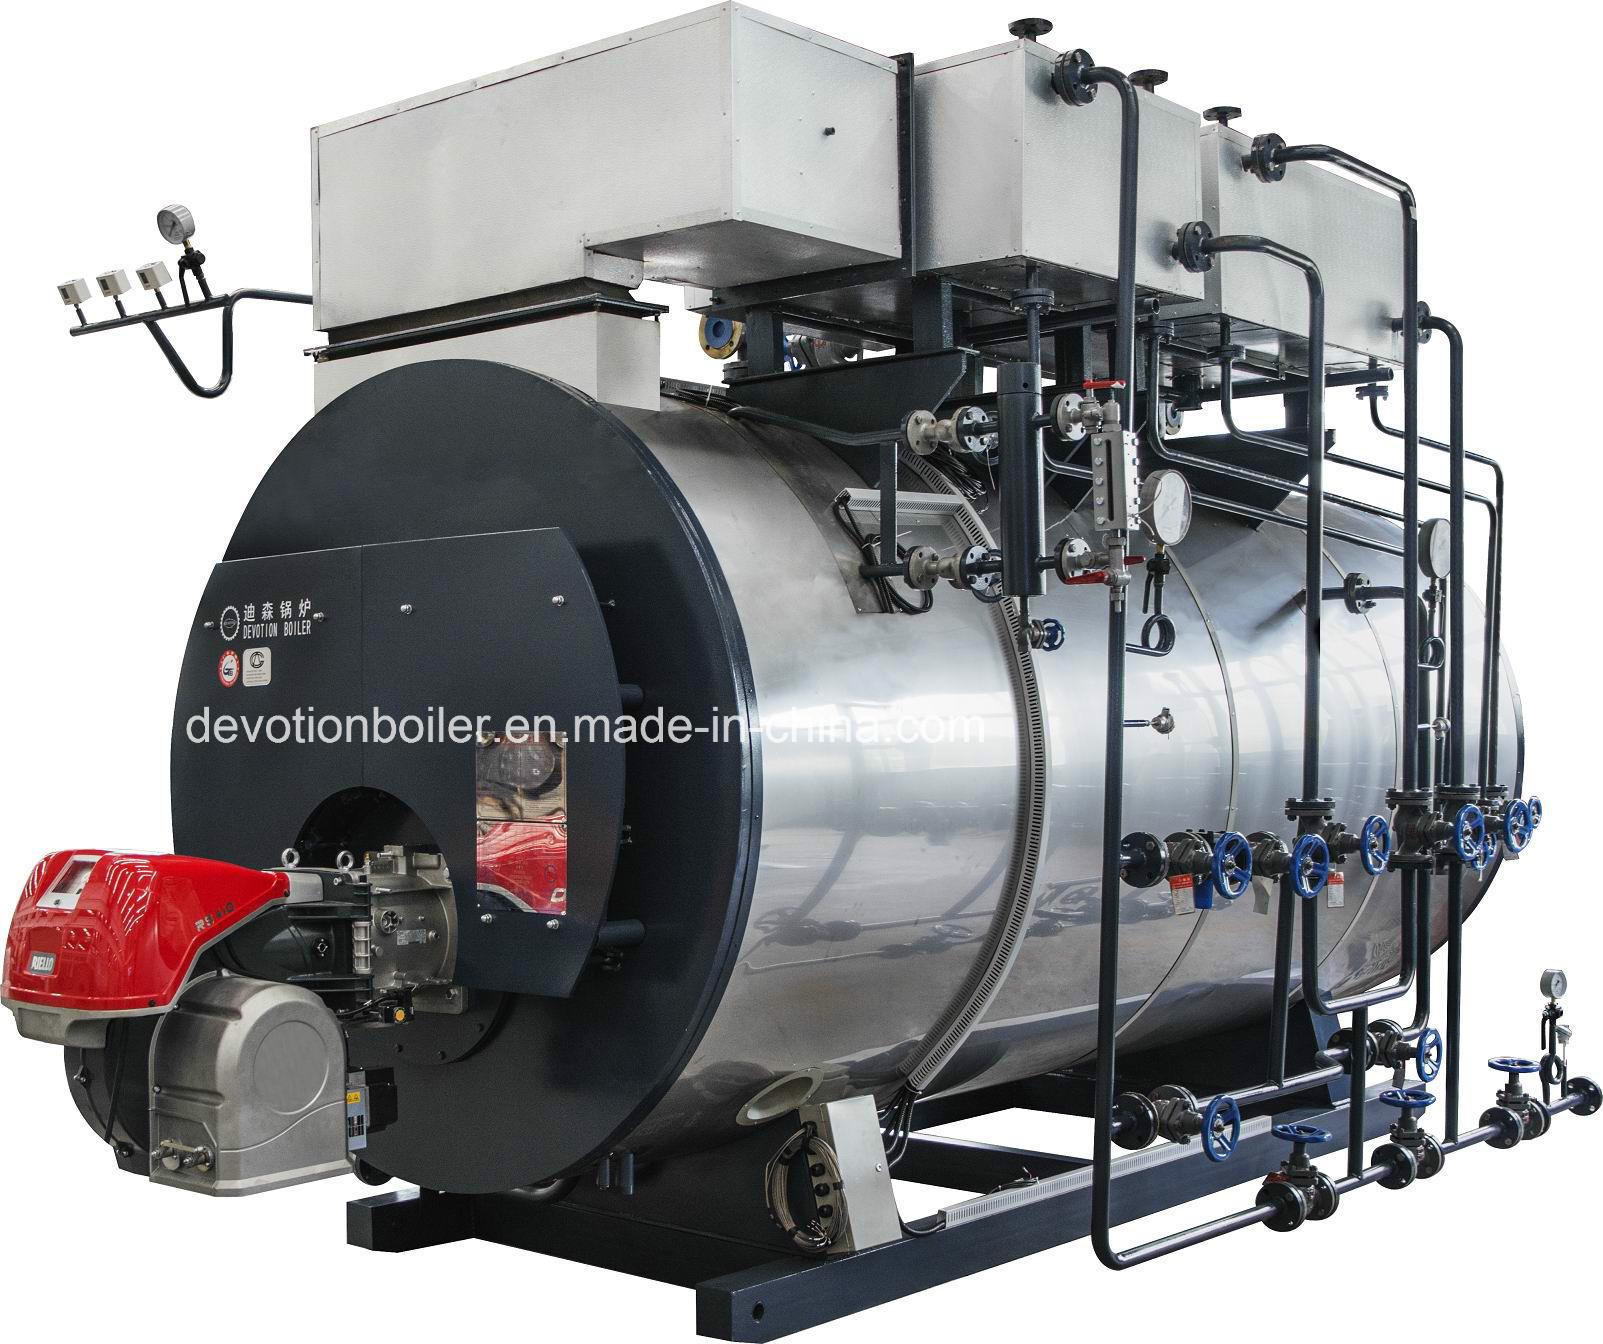 Enchanting Boiler Steam Inspiration - Electrical System Block ...